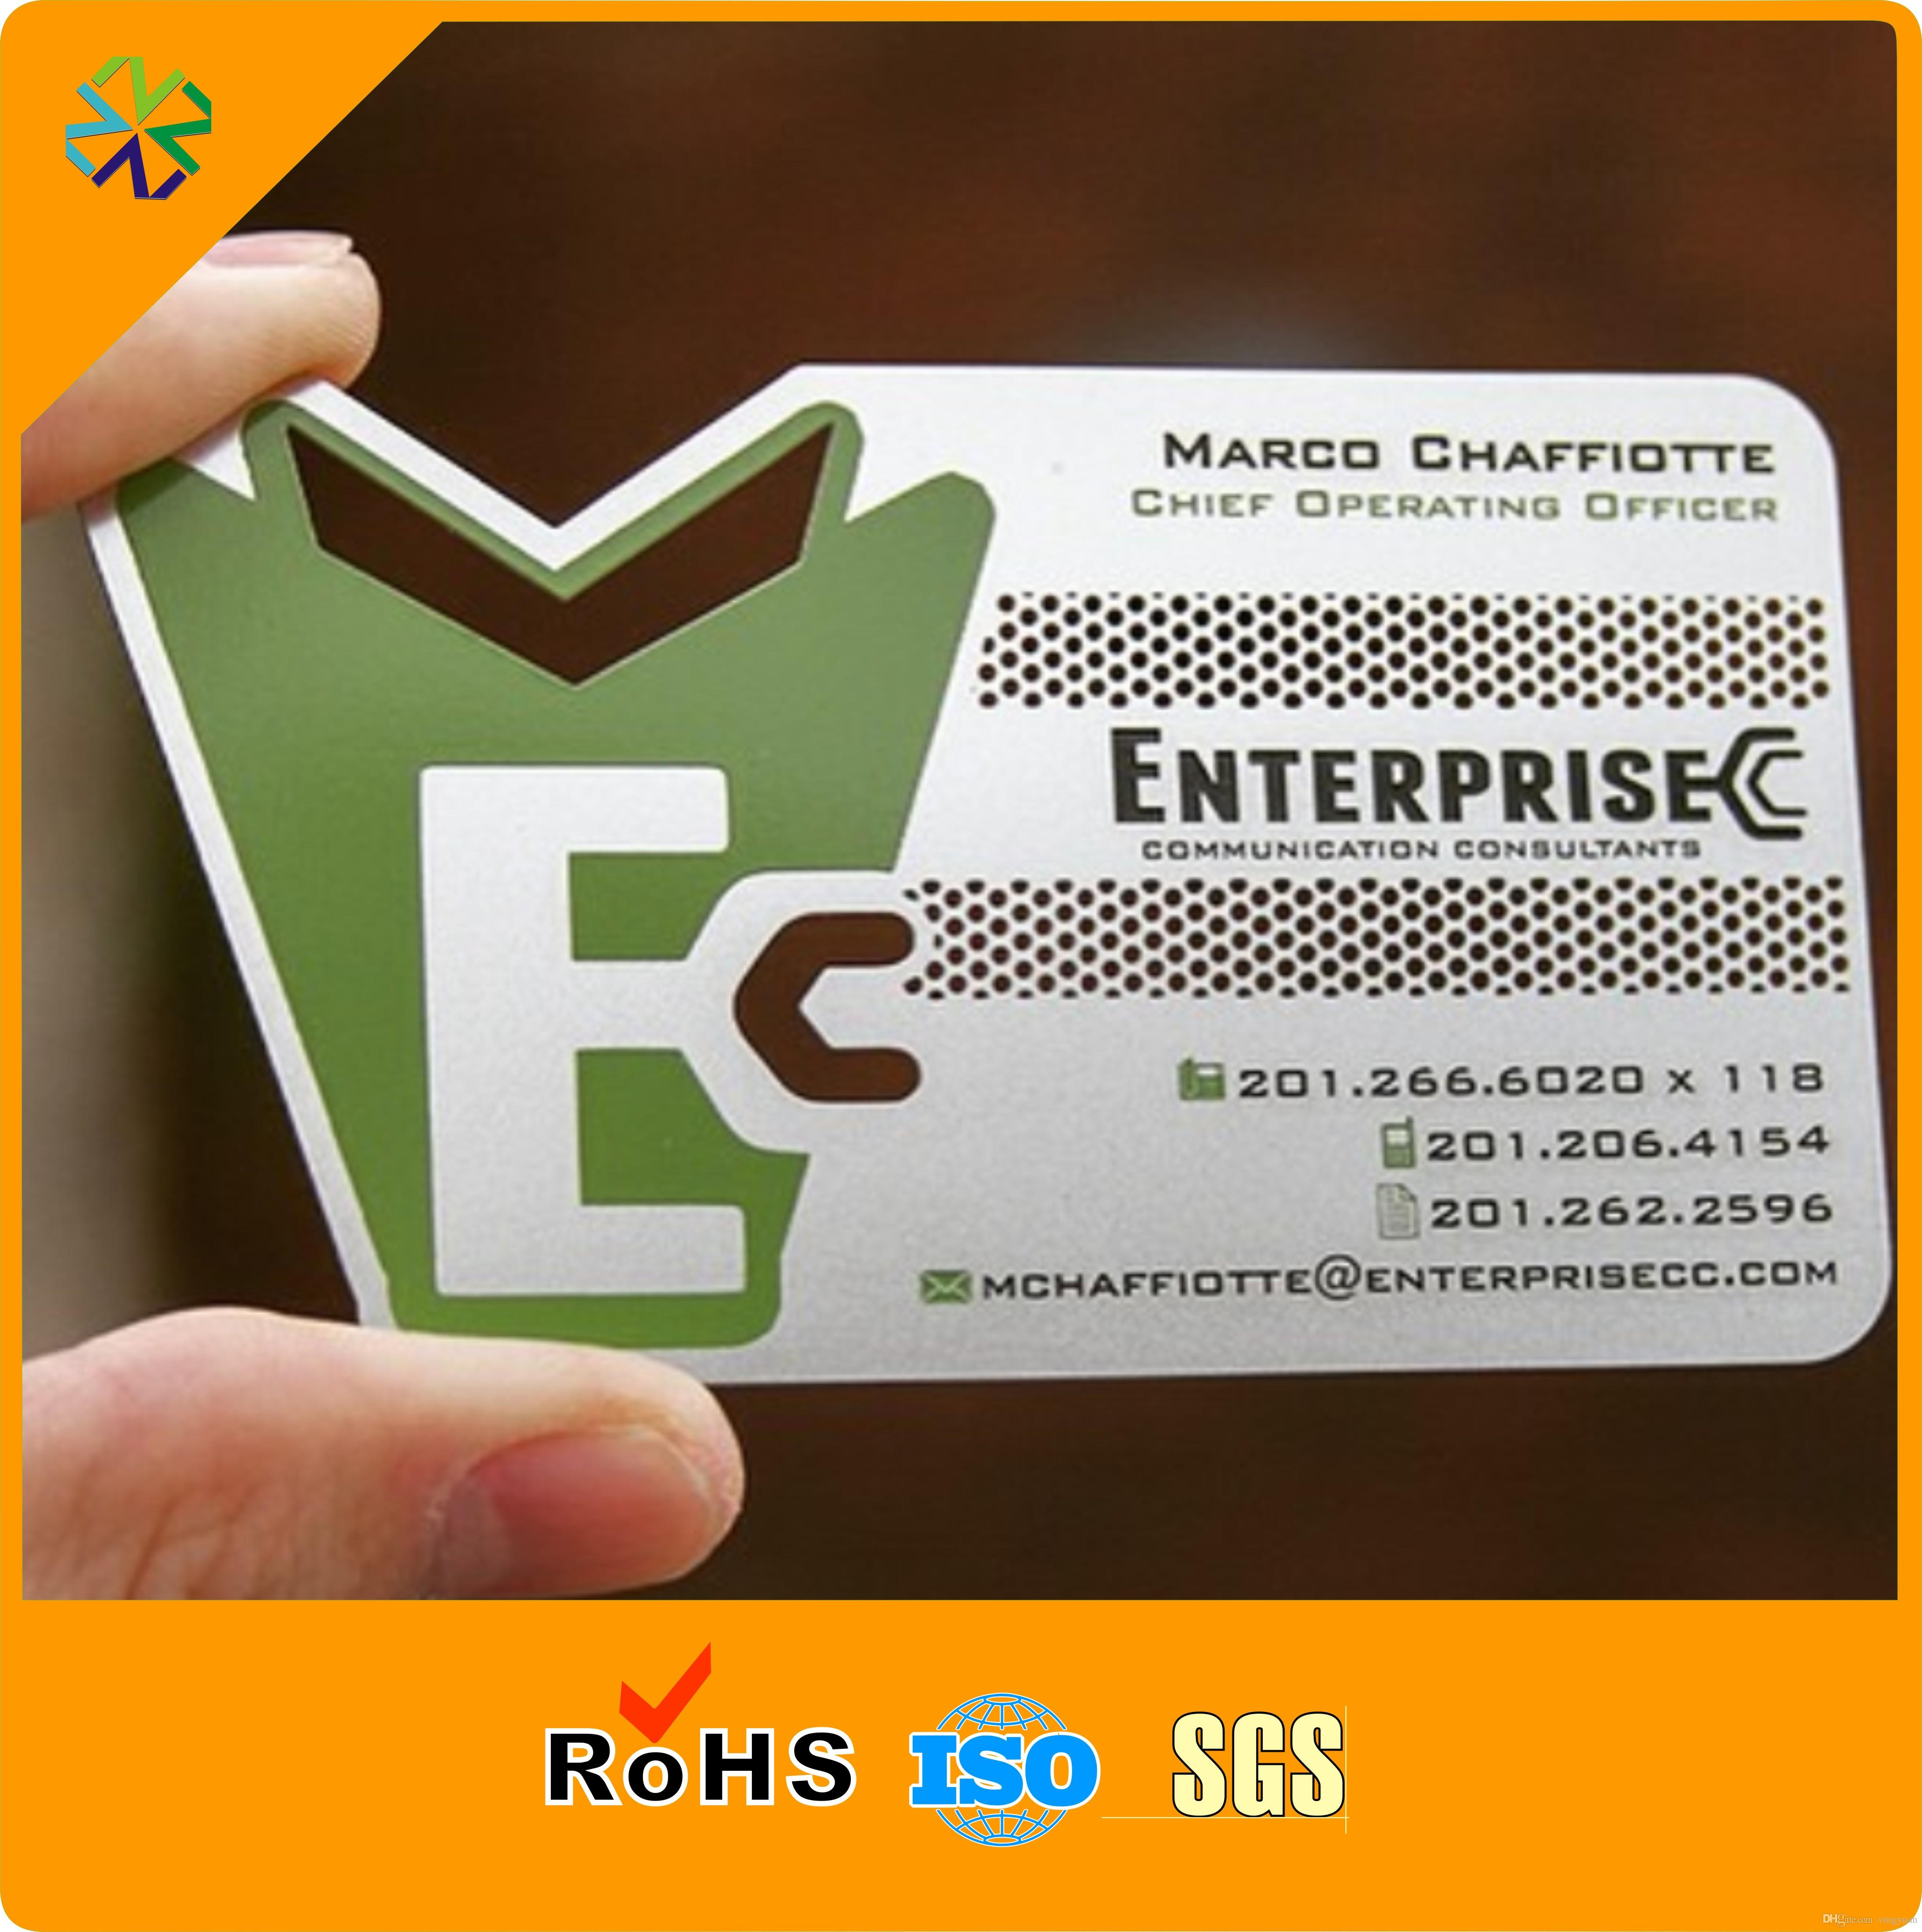 cheap 304 stainless steel metal card metal business card die out words glossy stainless metal business cards stainless metal business cards metal business - Metal Business Cards Cheap